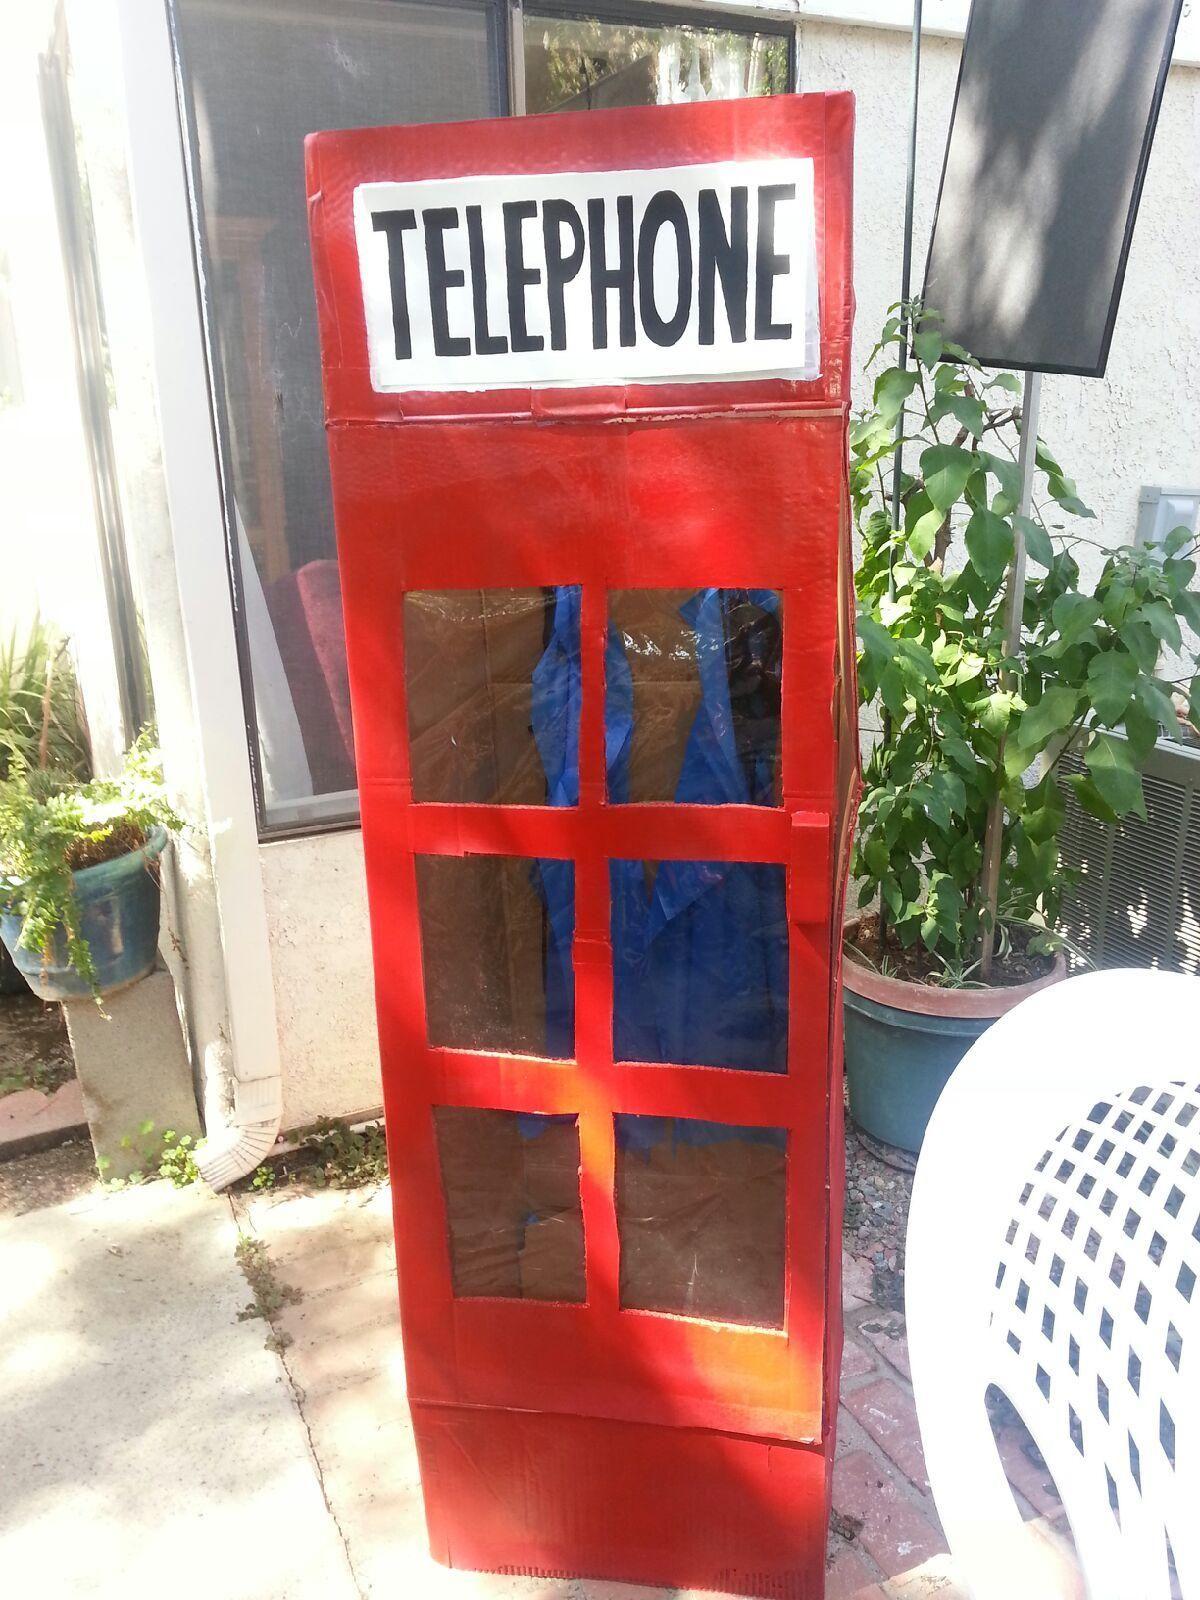 DIY Superhero phone booth made from a wardrobe box